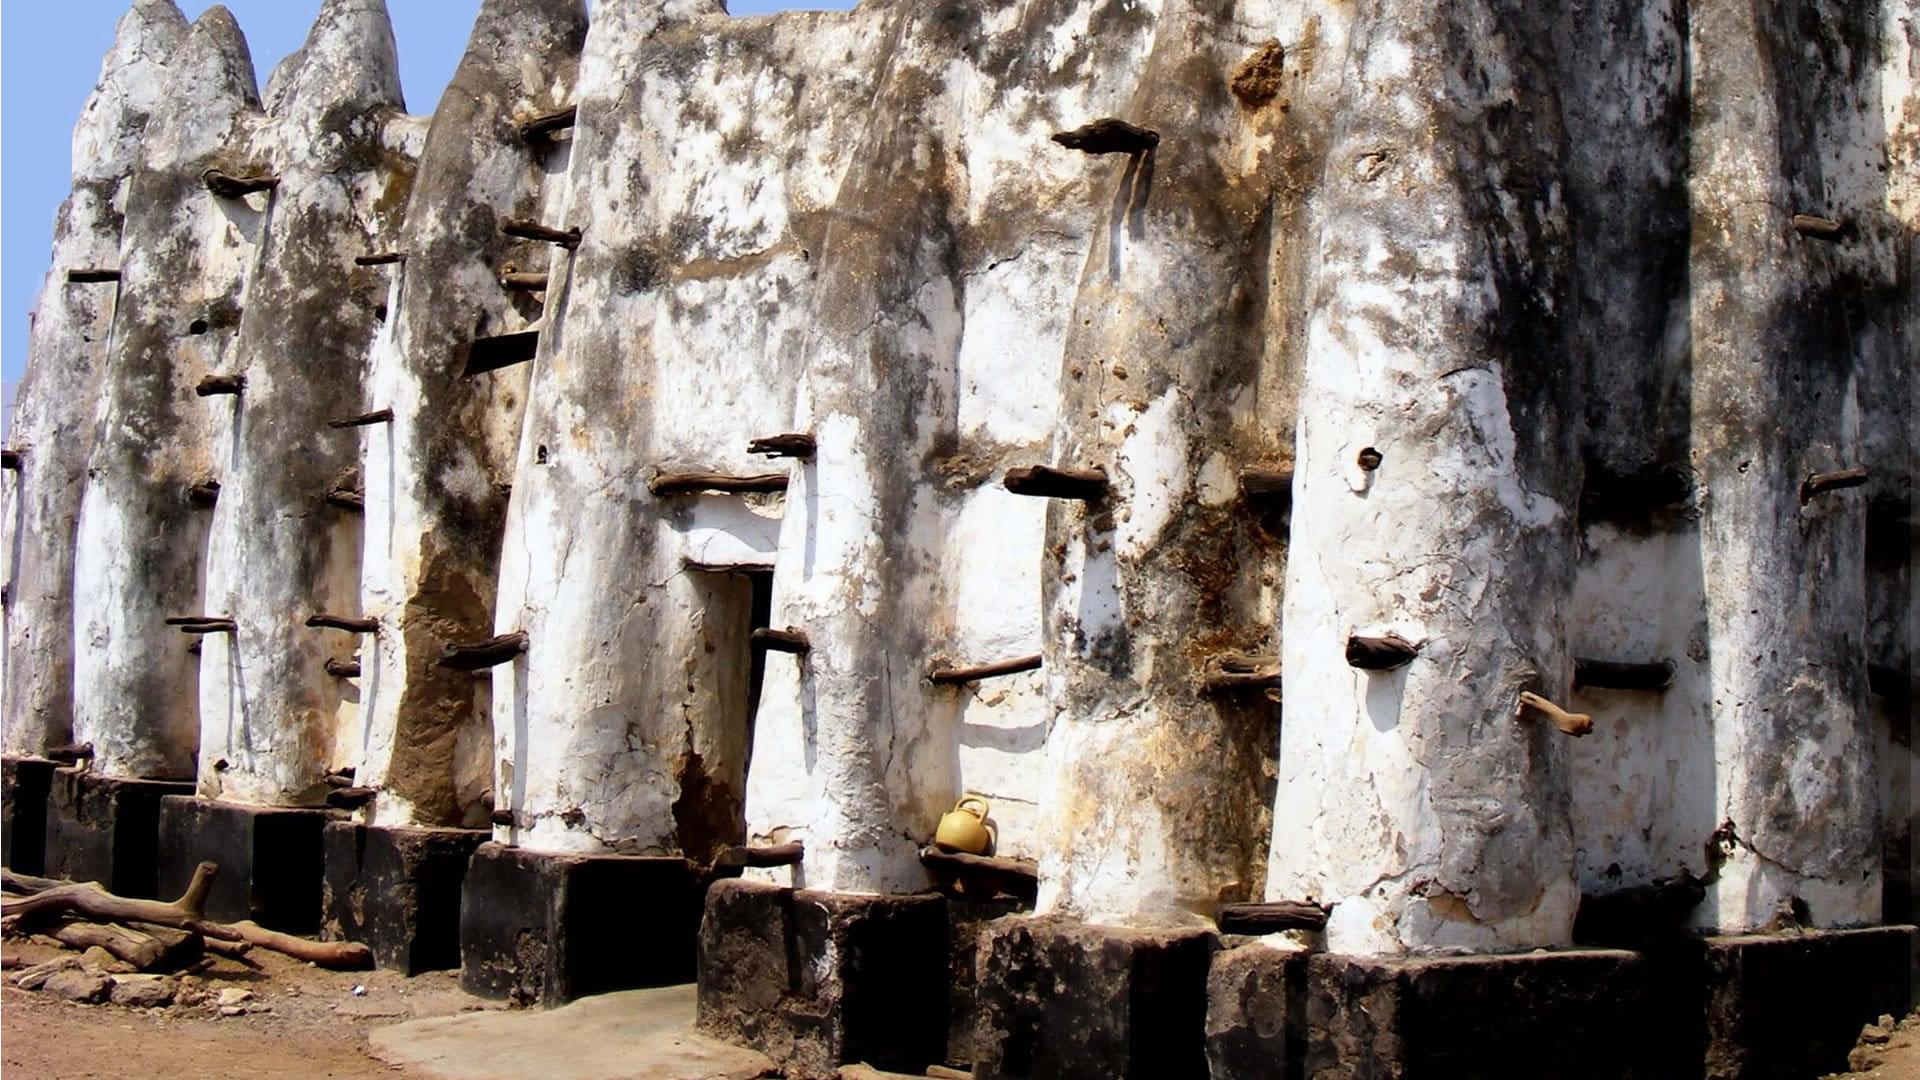 Bole Mosque